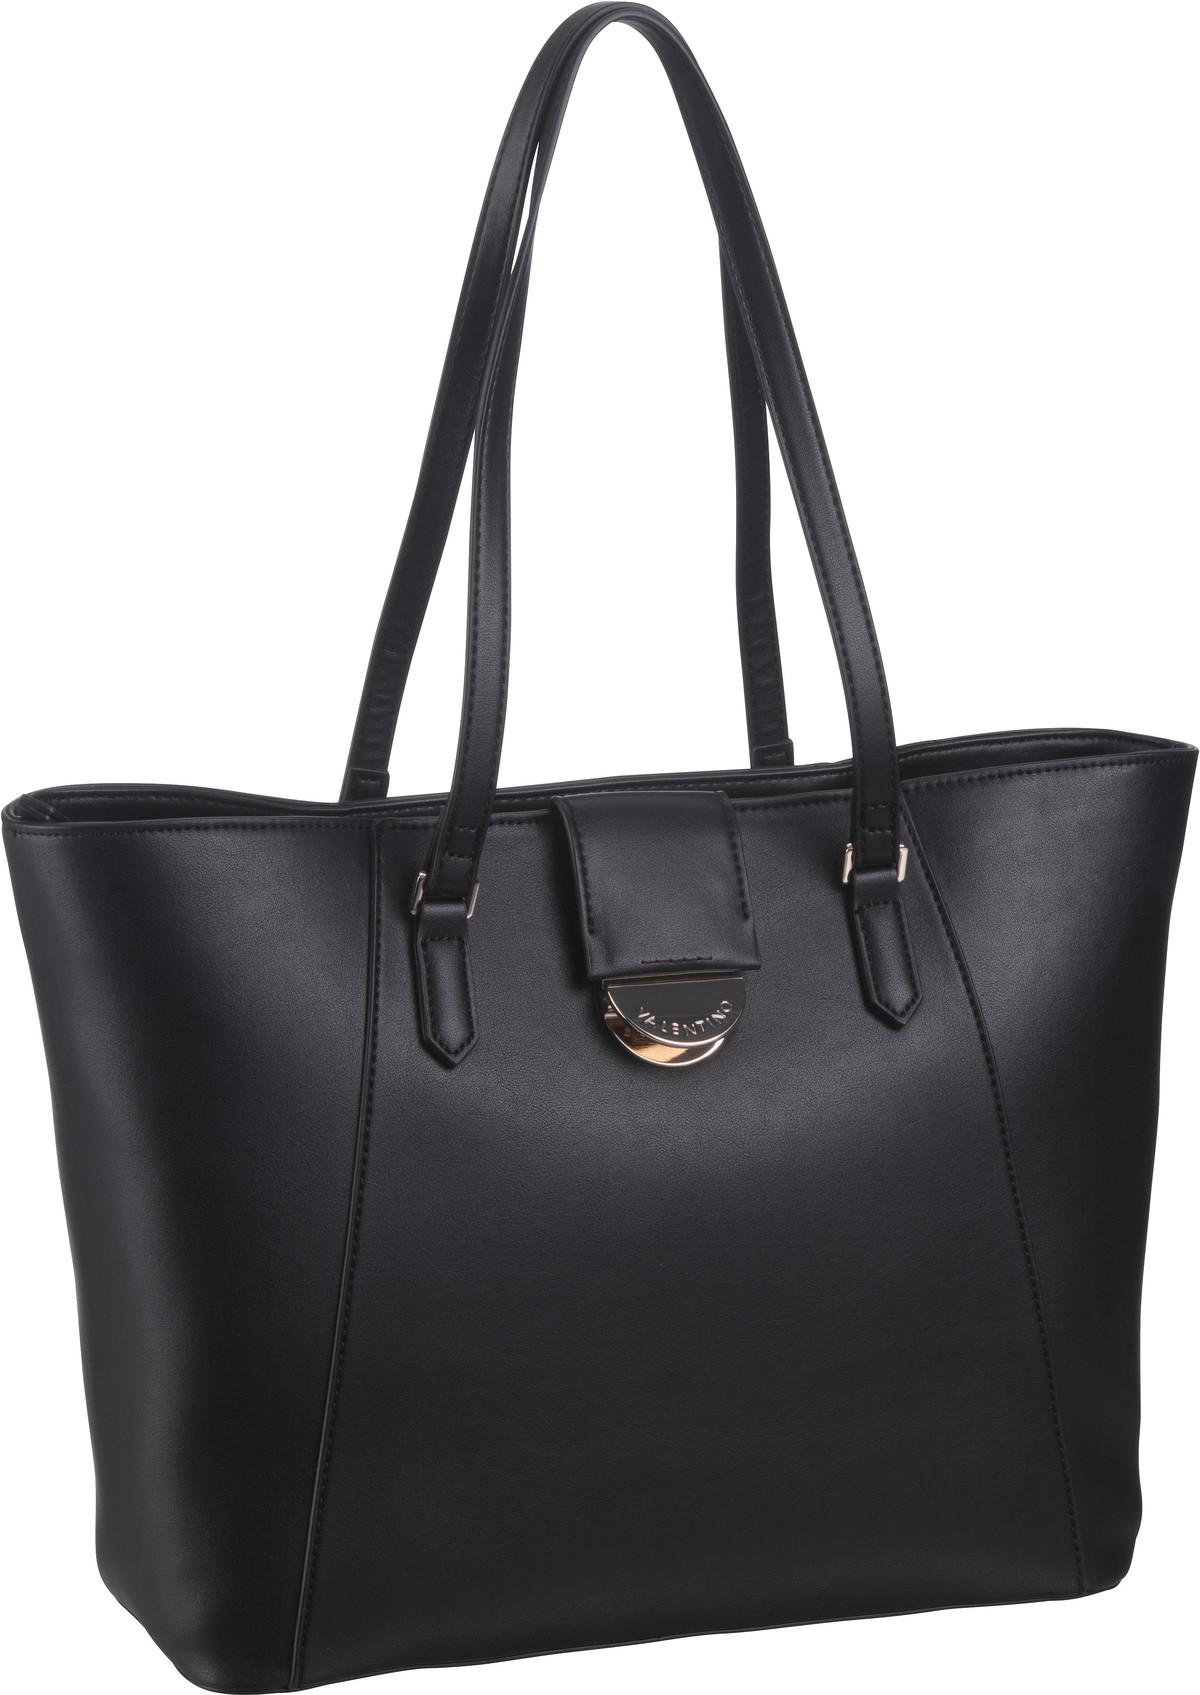 valentino bags -  Handtasche Falcor Shopping P01 Nero